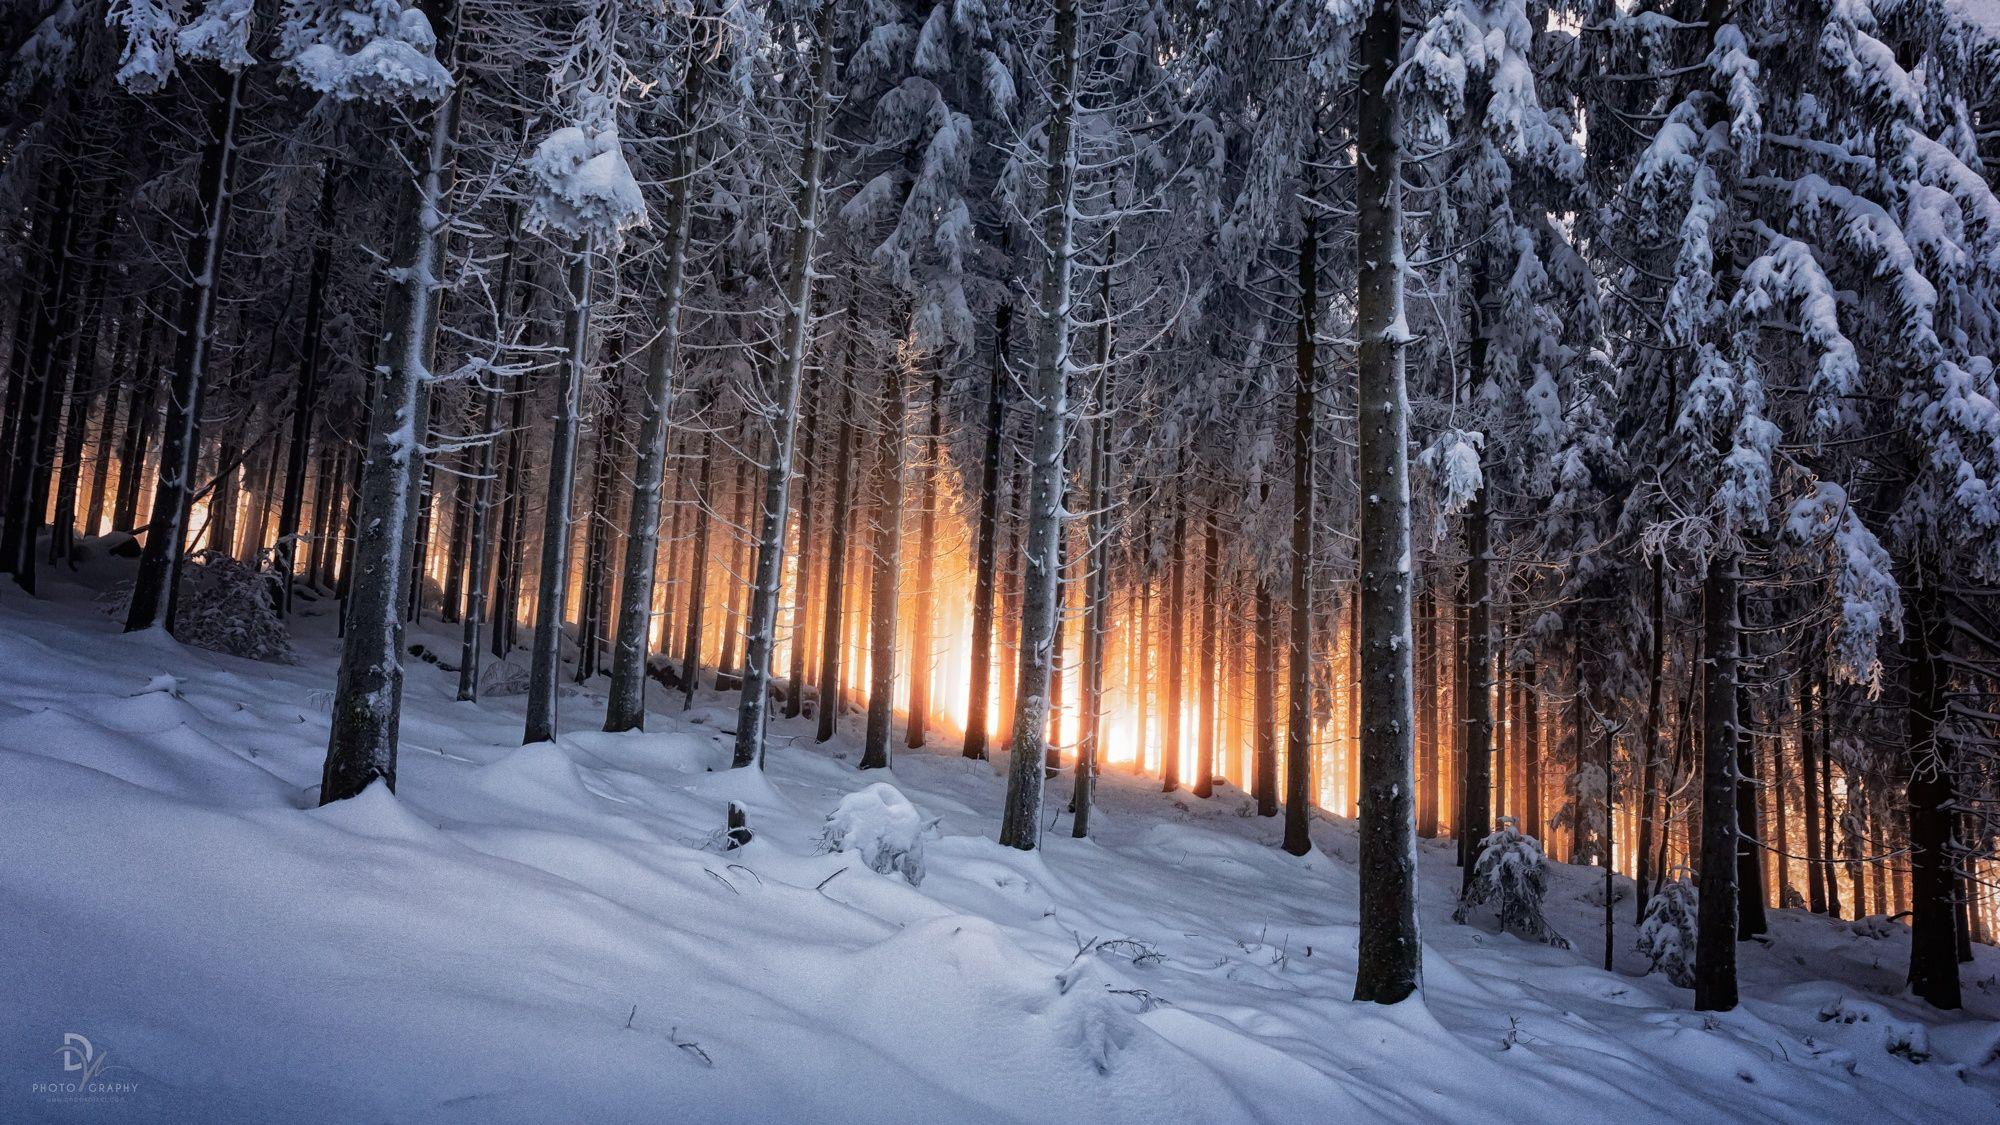 photograph morning energy by daniel vogelbacher on 500px 500pix